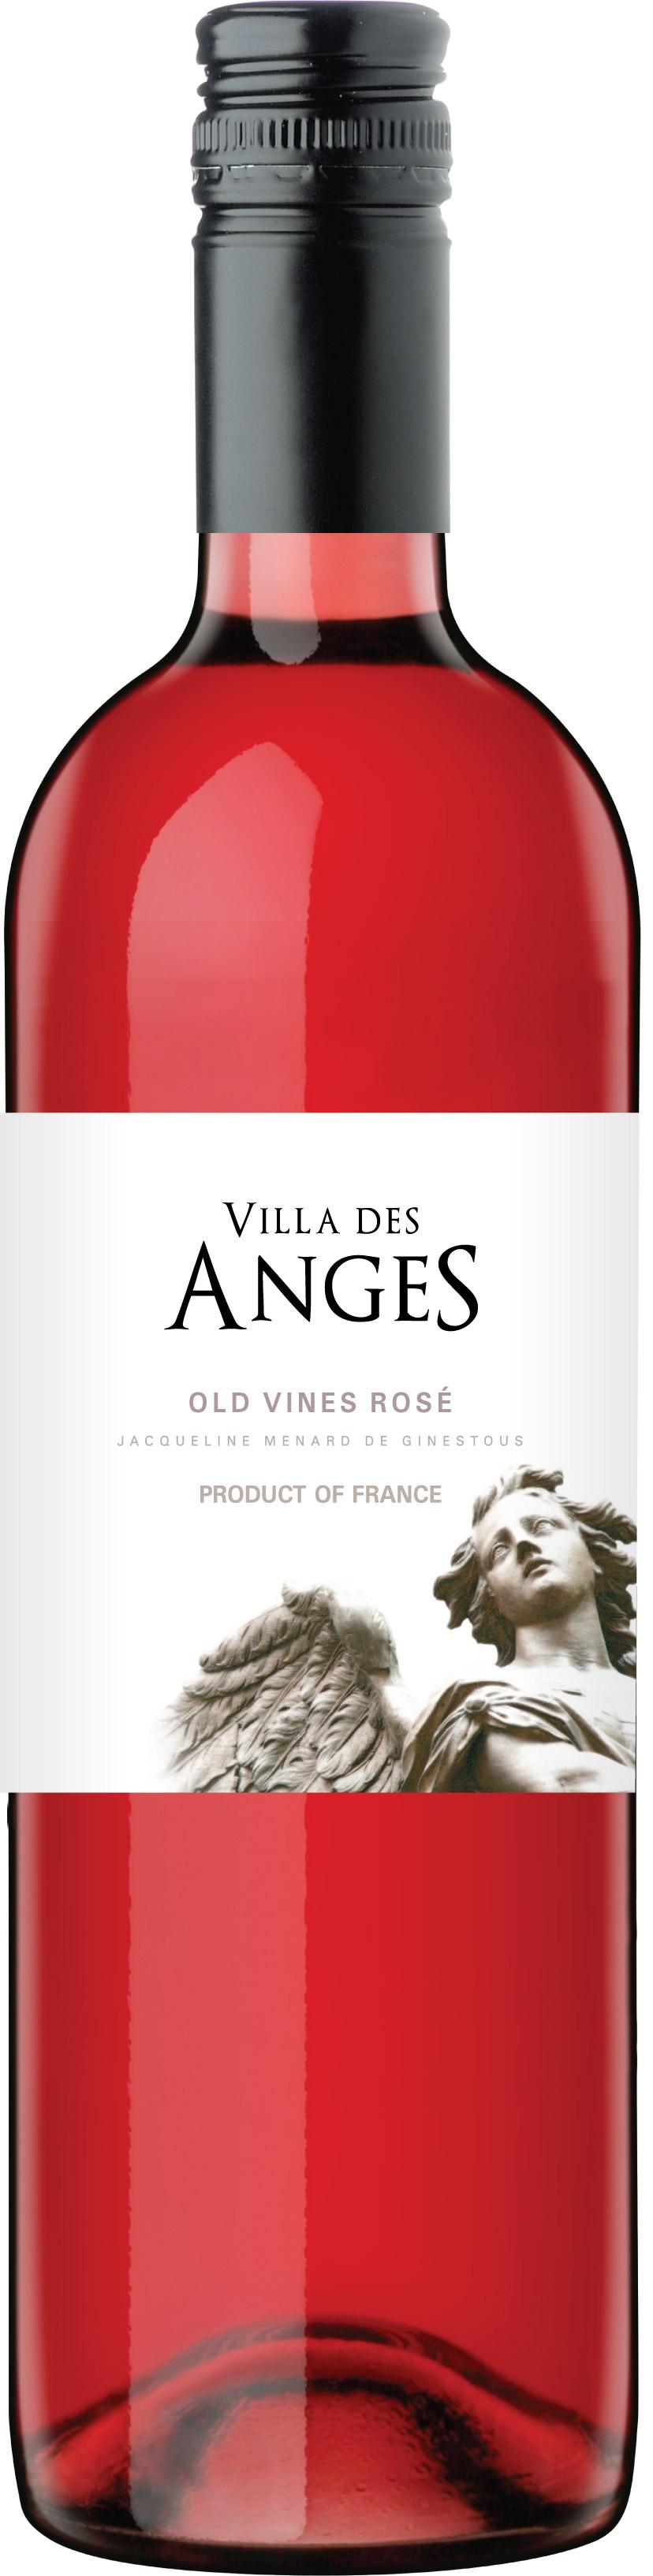 Villa Des Anges Wine Vino Mxm Wine And Beer Wine Wine And Spirits